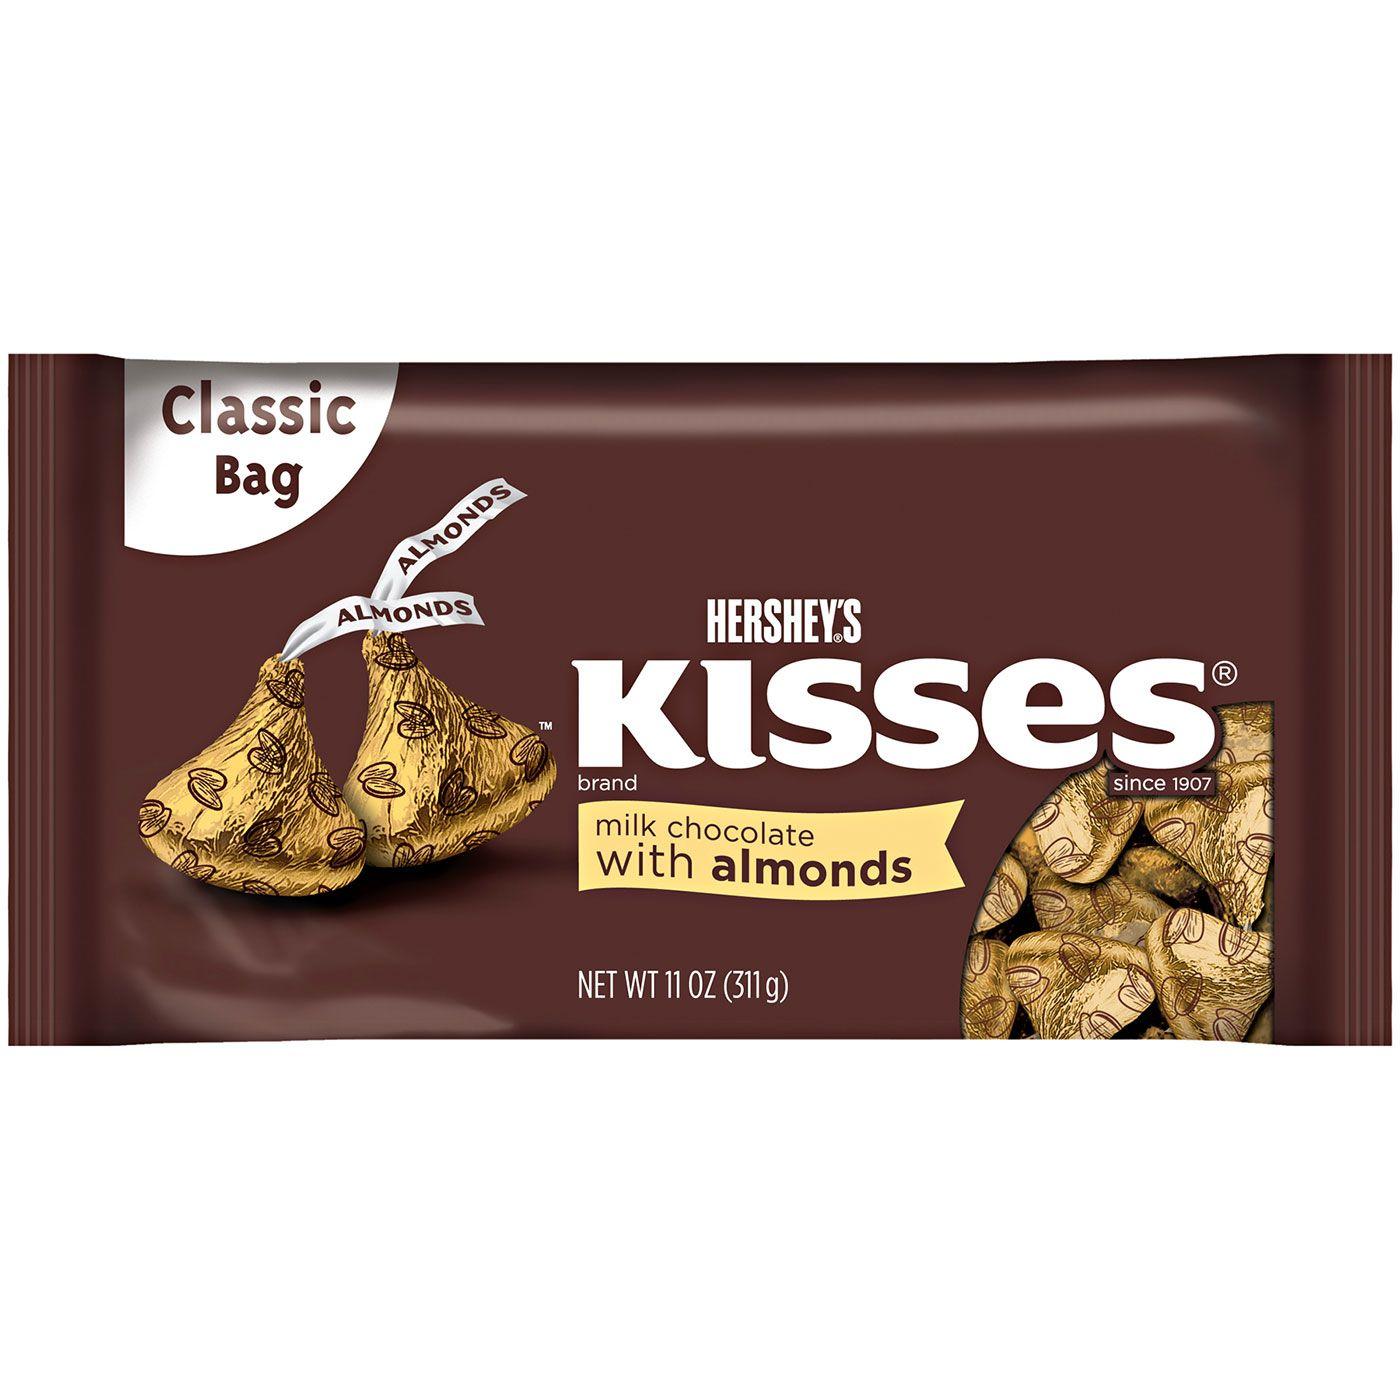 Hershey's Milk Chocolate Kisses with Almonds! hersheysstore.com ...